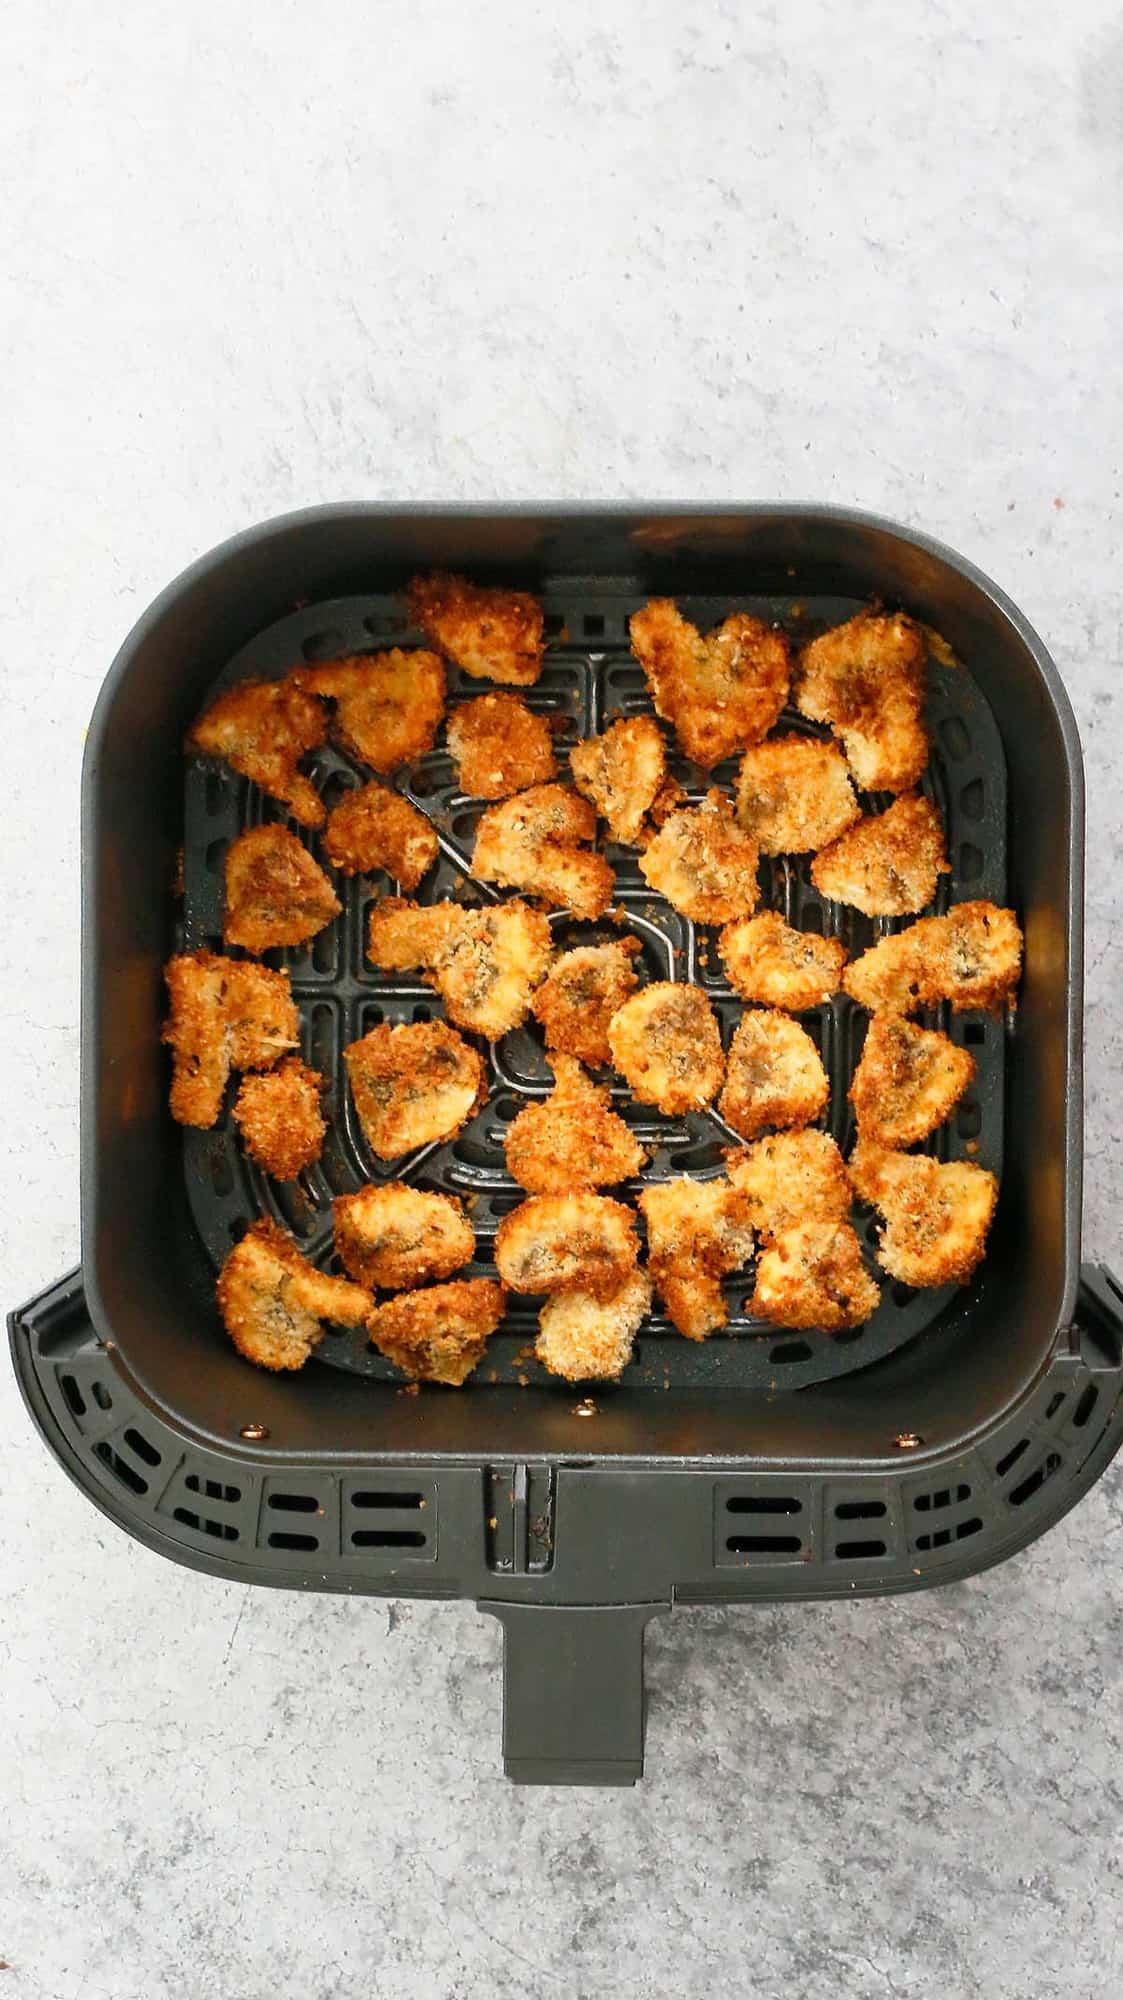 an air fryer basket with crispy breaded mushrooms